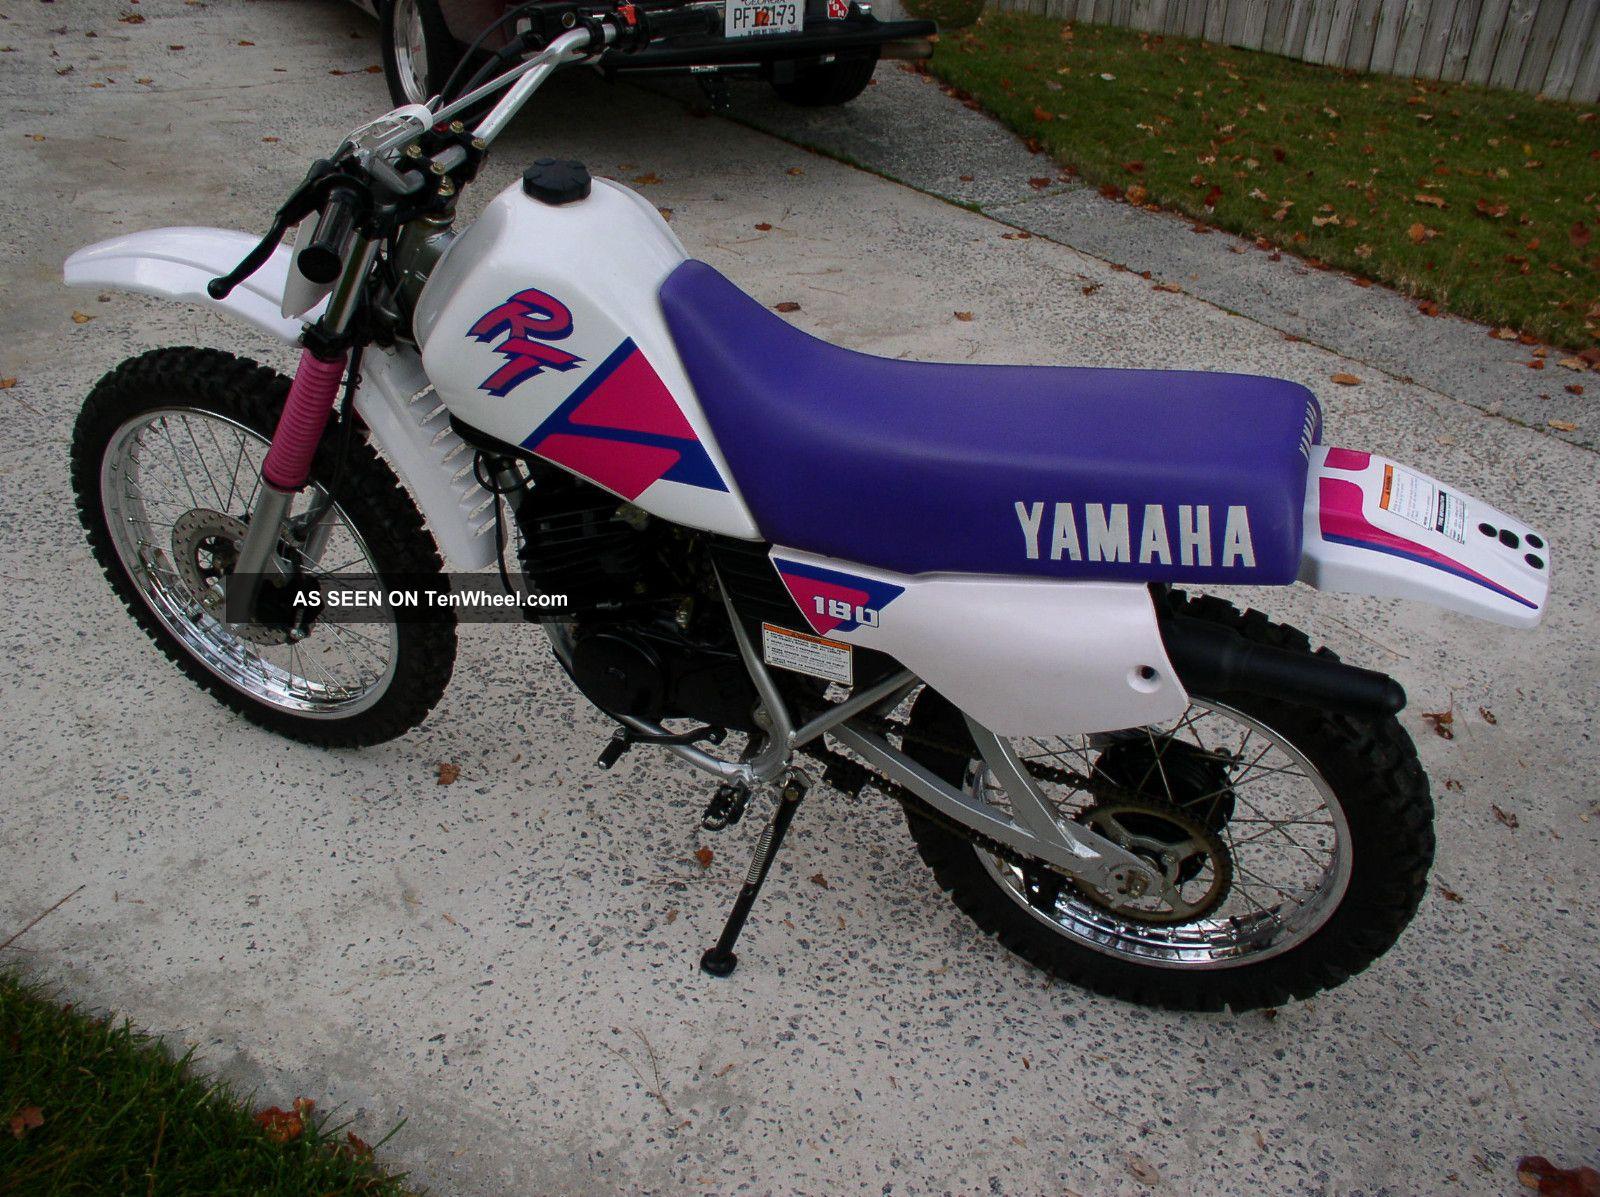 Yamaha Rt Dirt Bike Specs